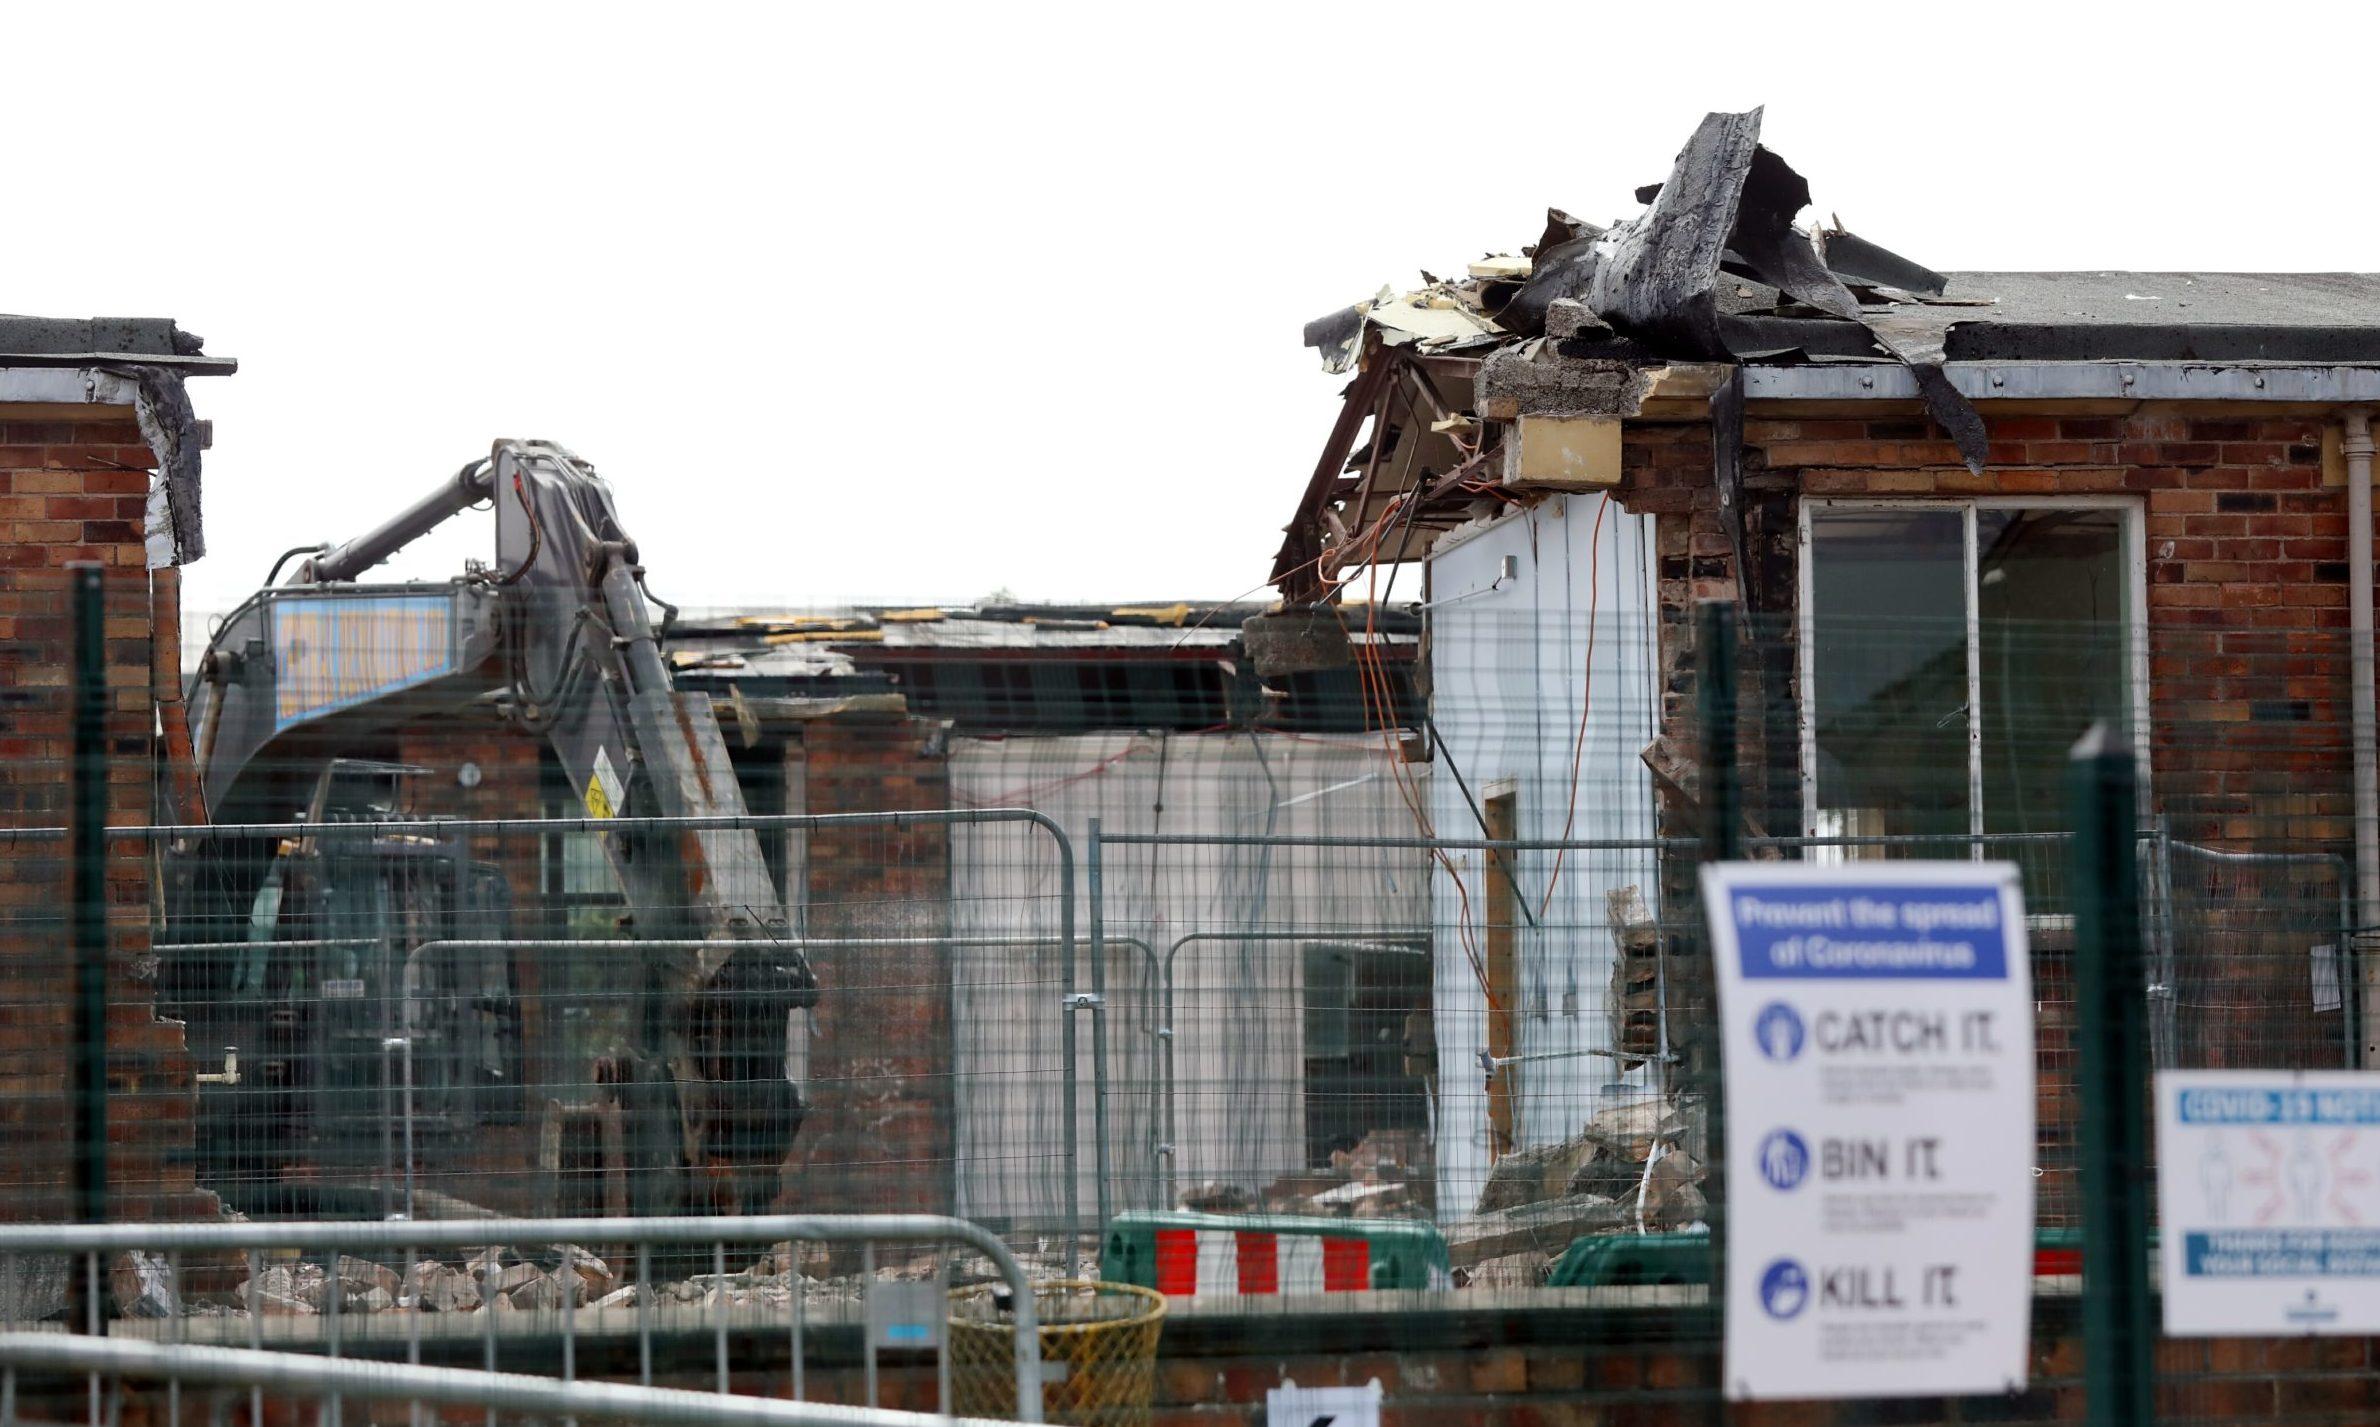 Demolition work on the old Hayshead Primary School.